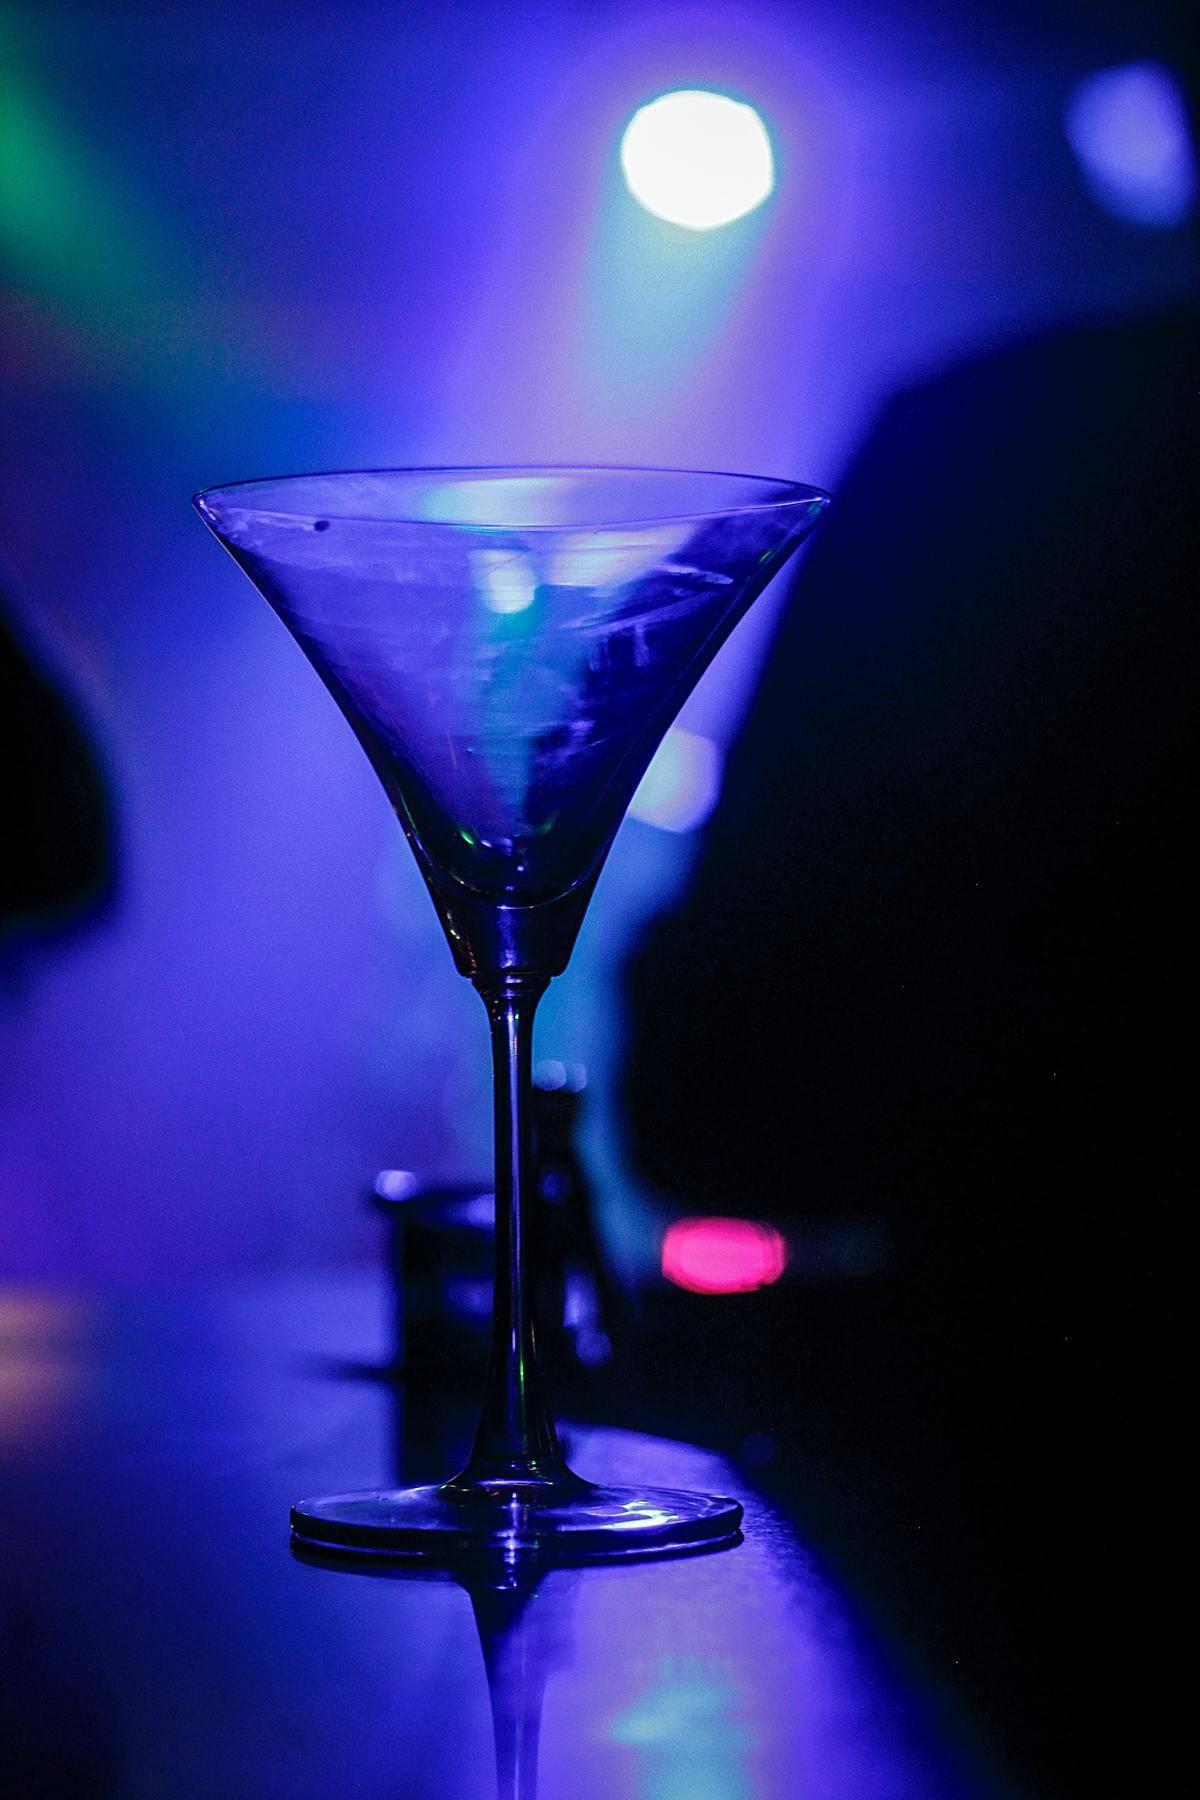 Martini glass on counter amid intense blue lighting